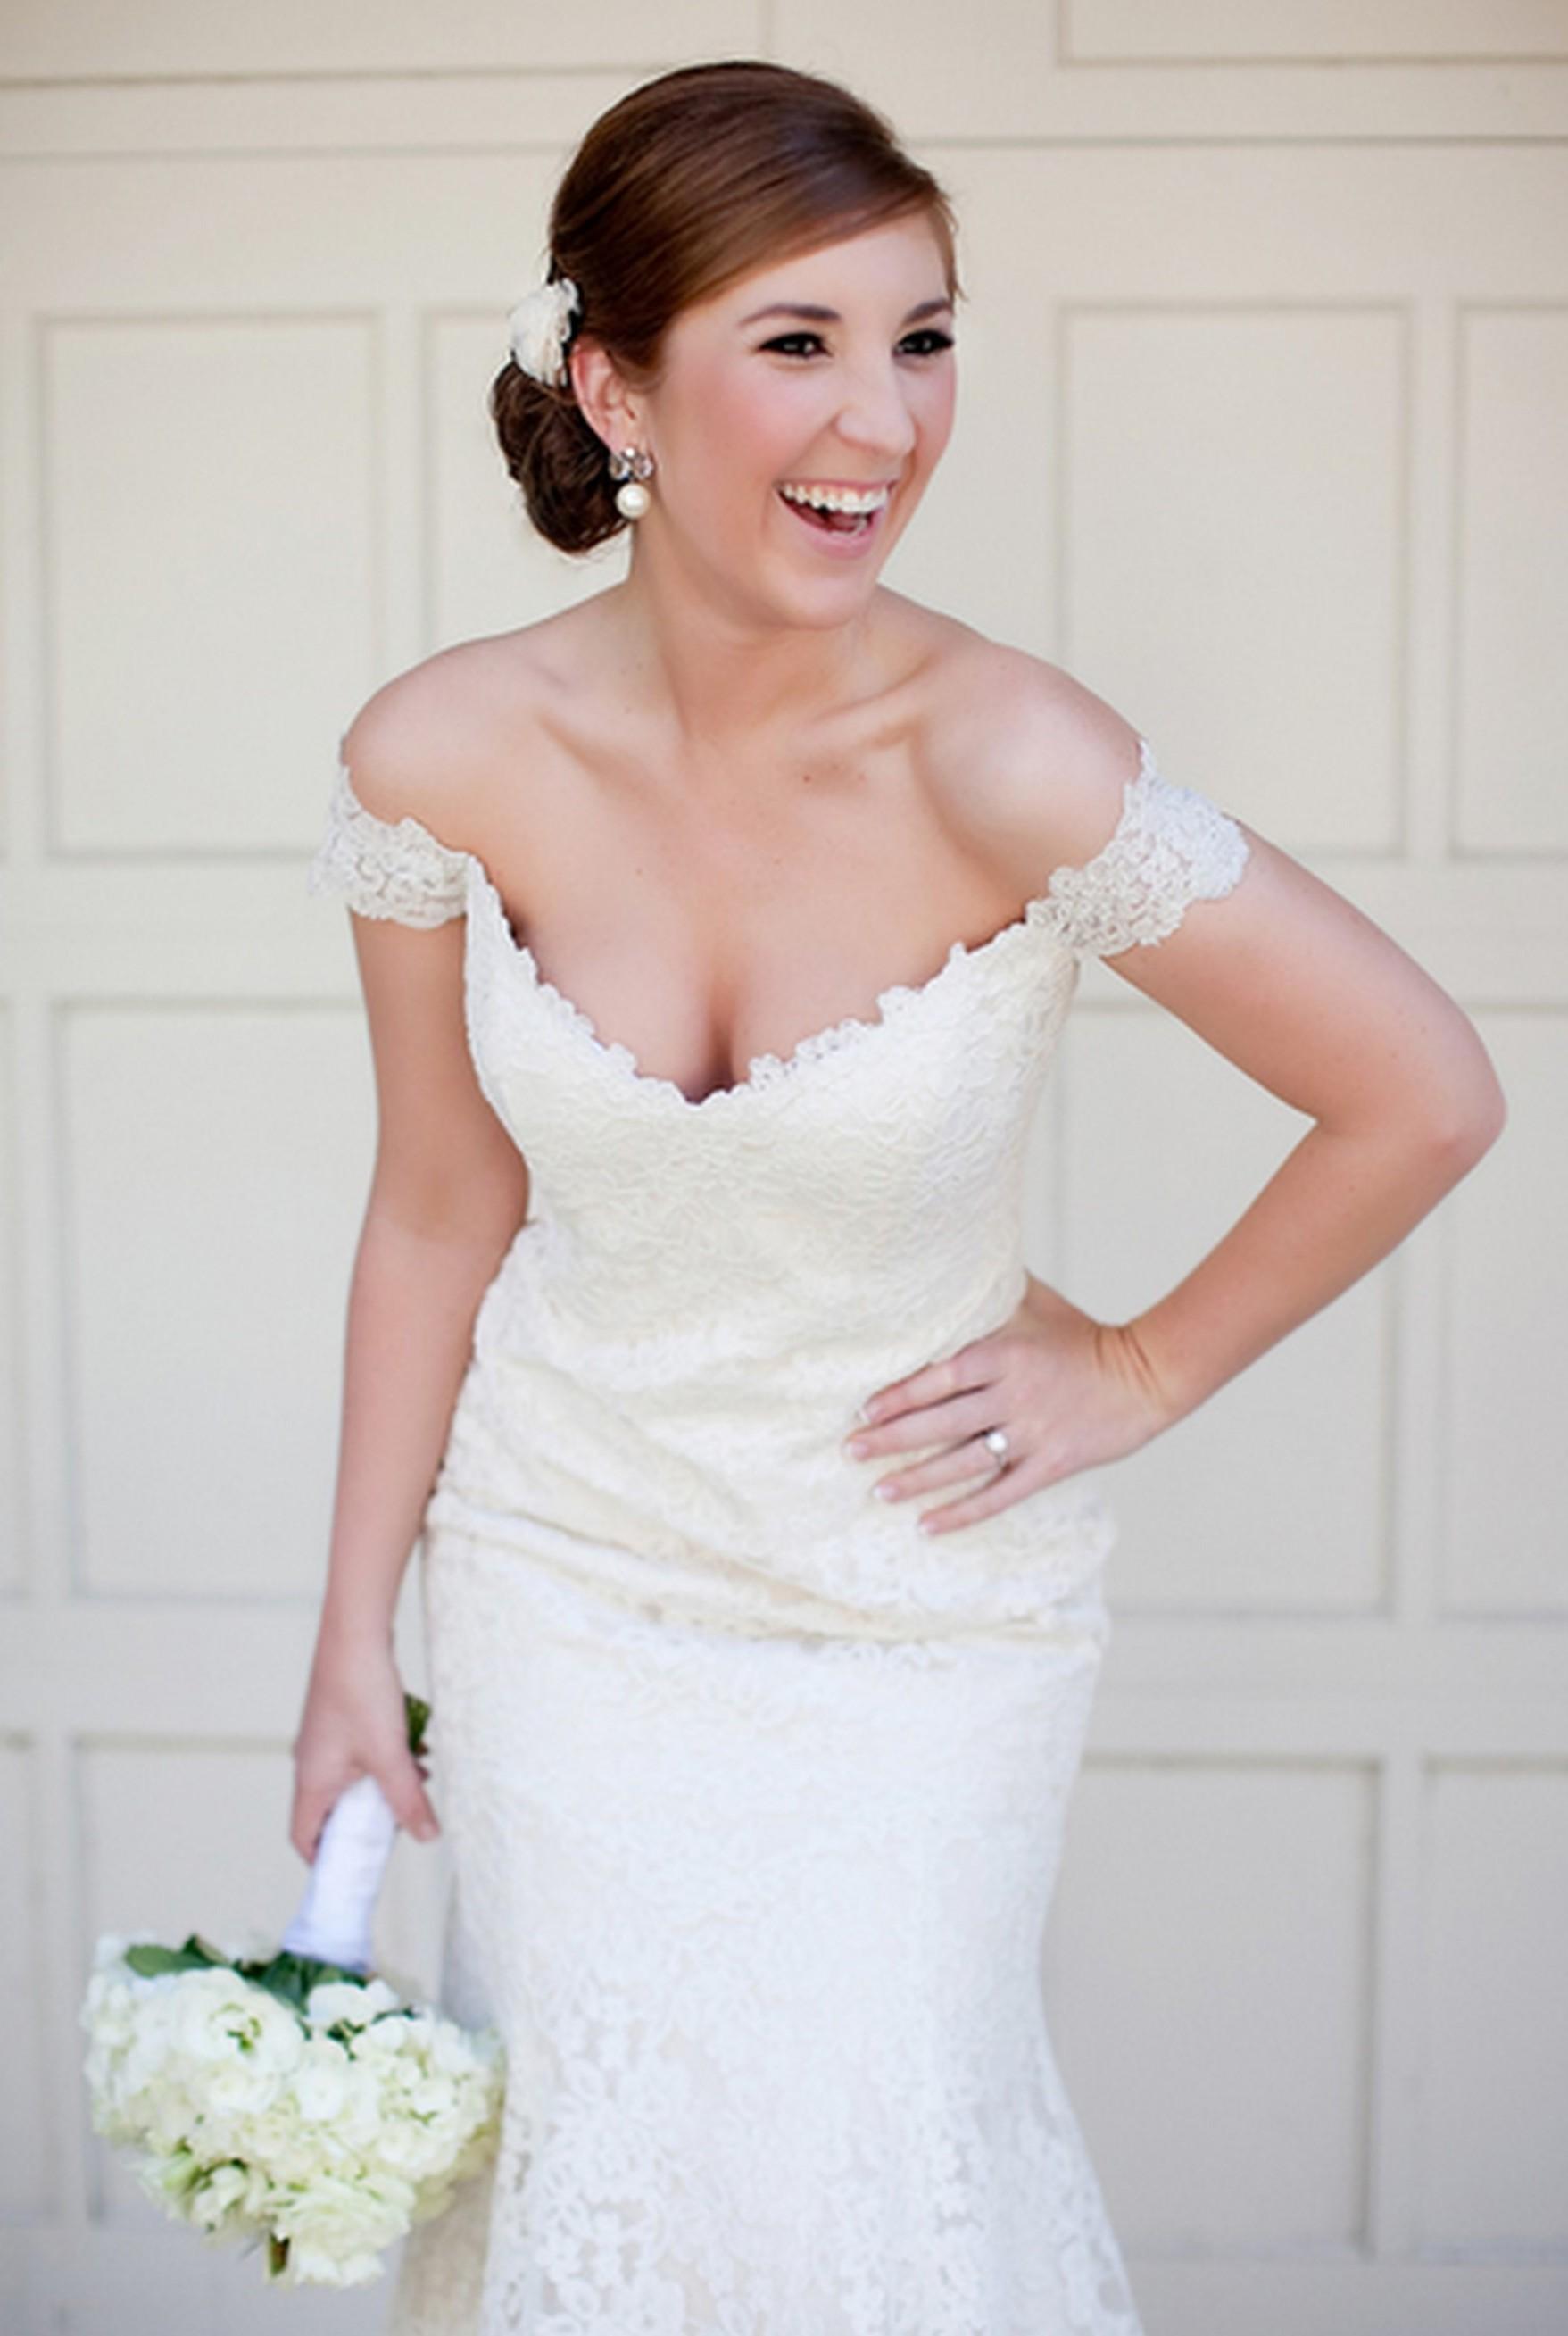 off the shoulder cap sleeve wedding dress cap sleeve wedding dress off the shoulder cap sleeve wedding dress